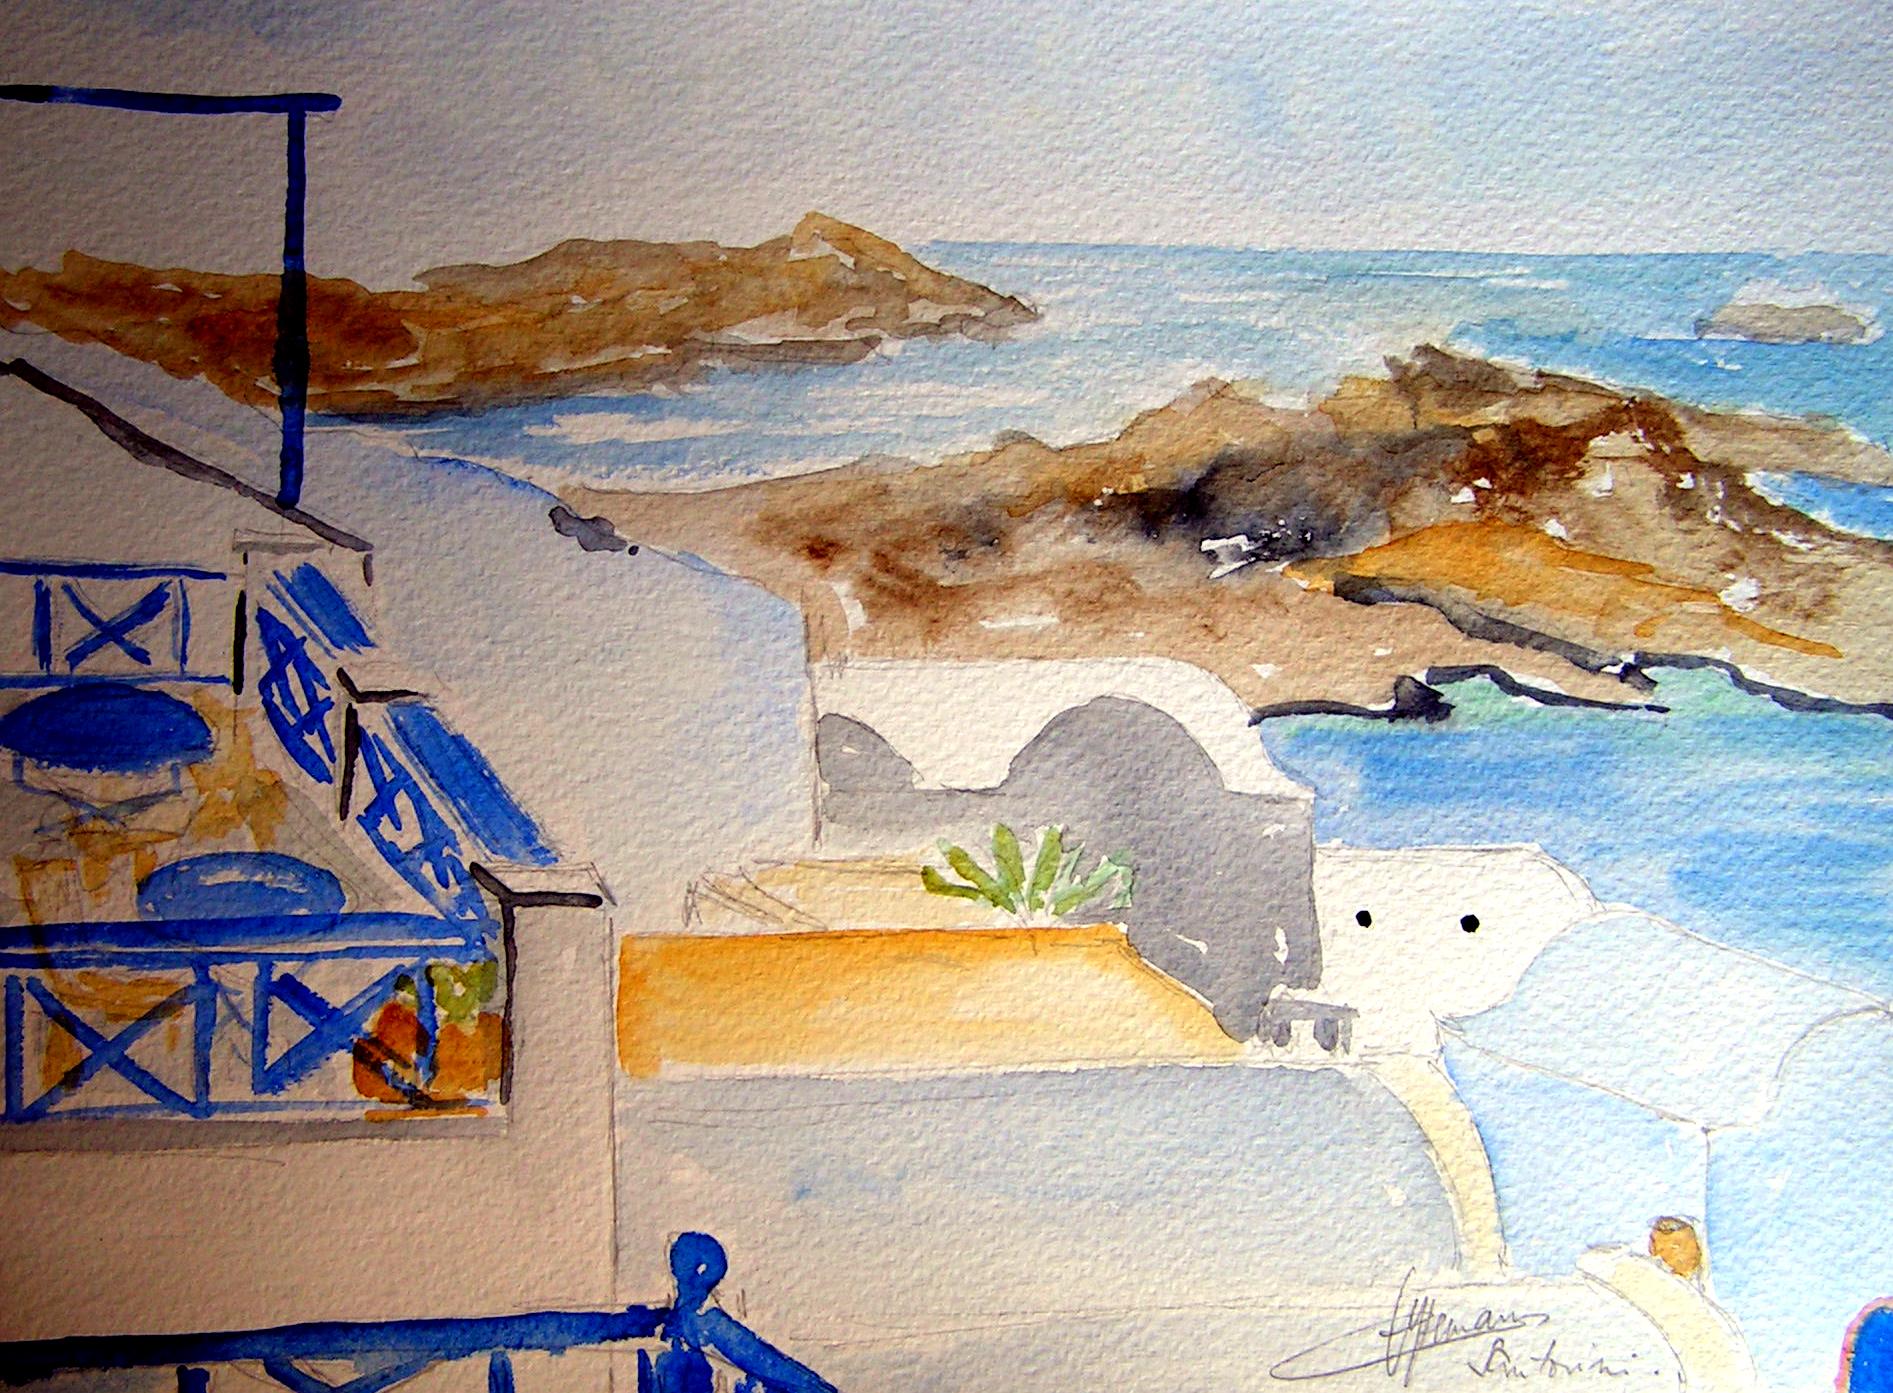 grece depuis un balcon , vur sur volcan